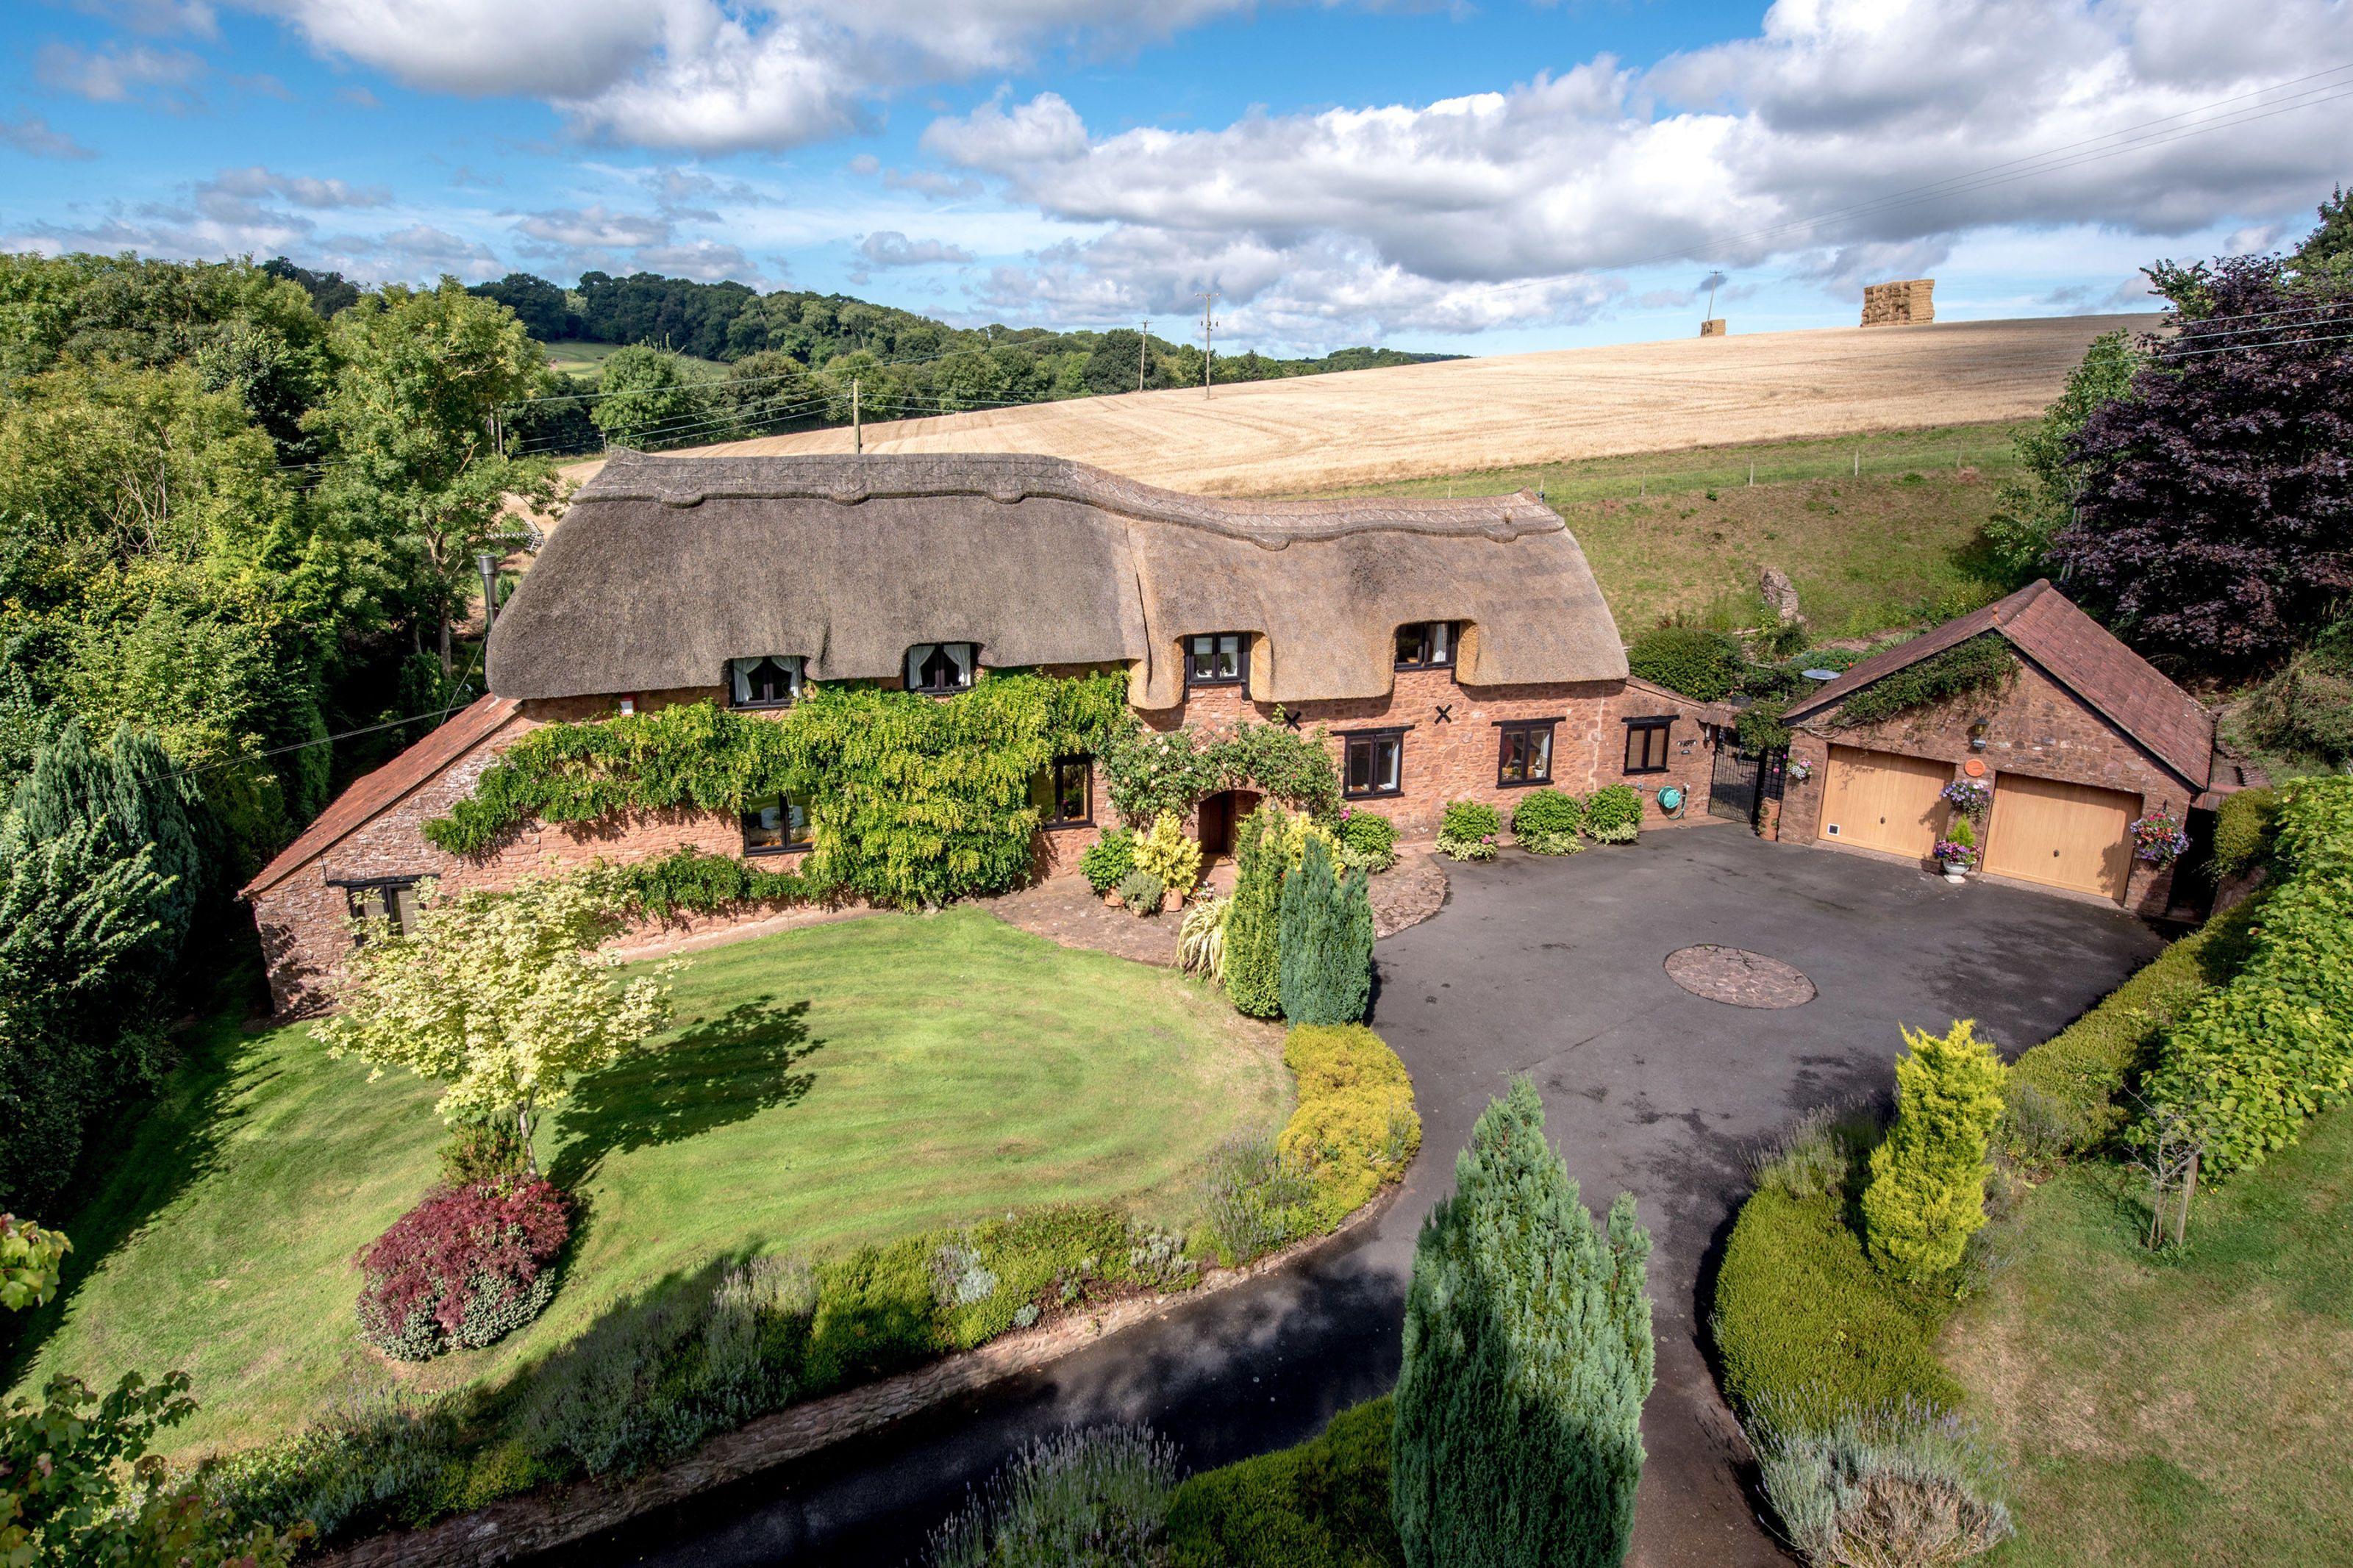 Combe Florey   Taunton   Somerset   Cottage   Exterior   OnTheMarket.com